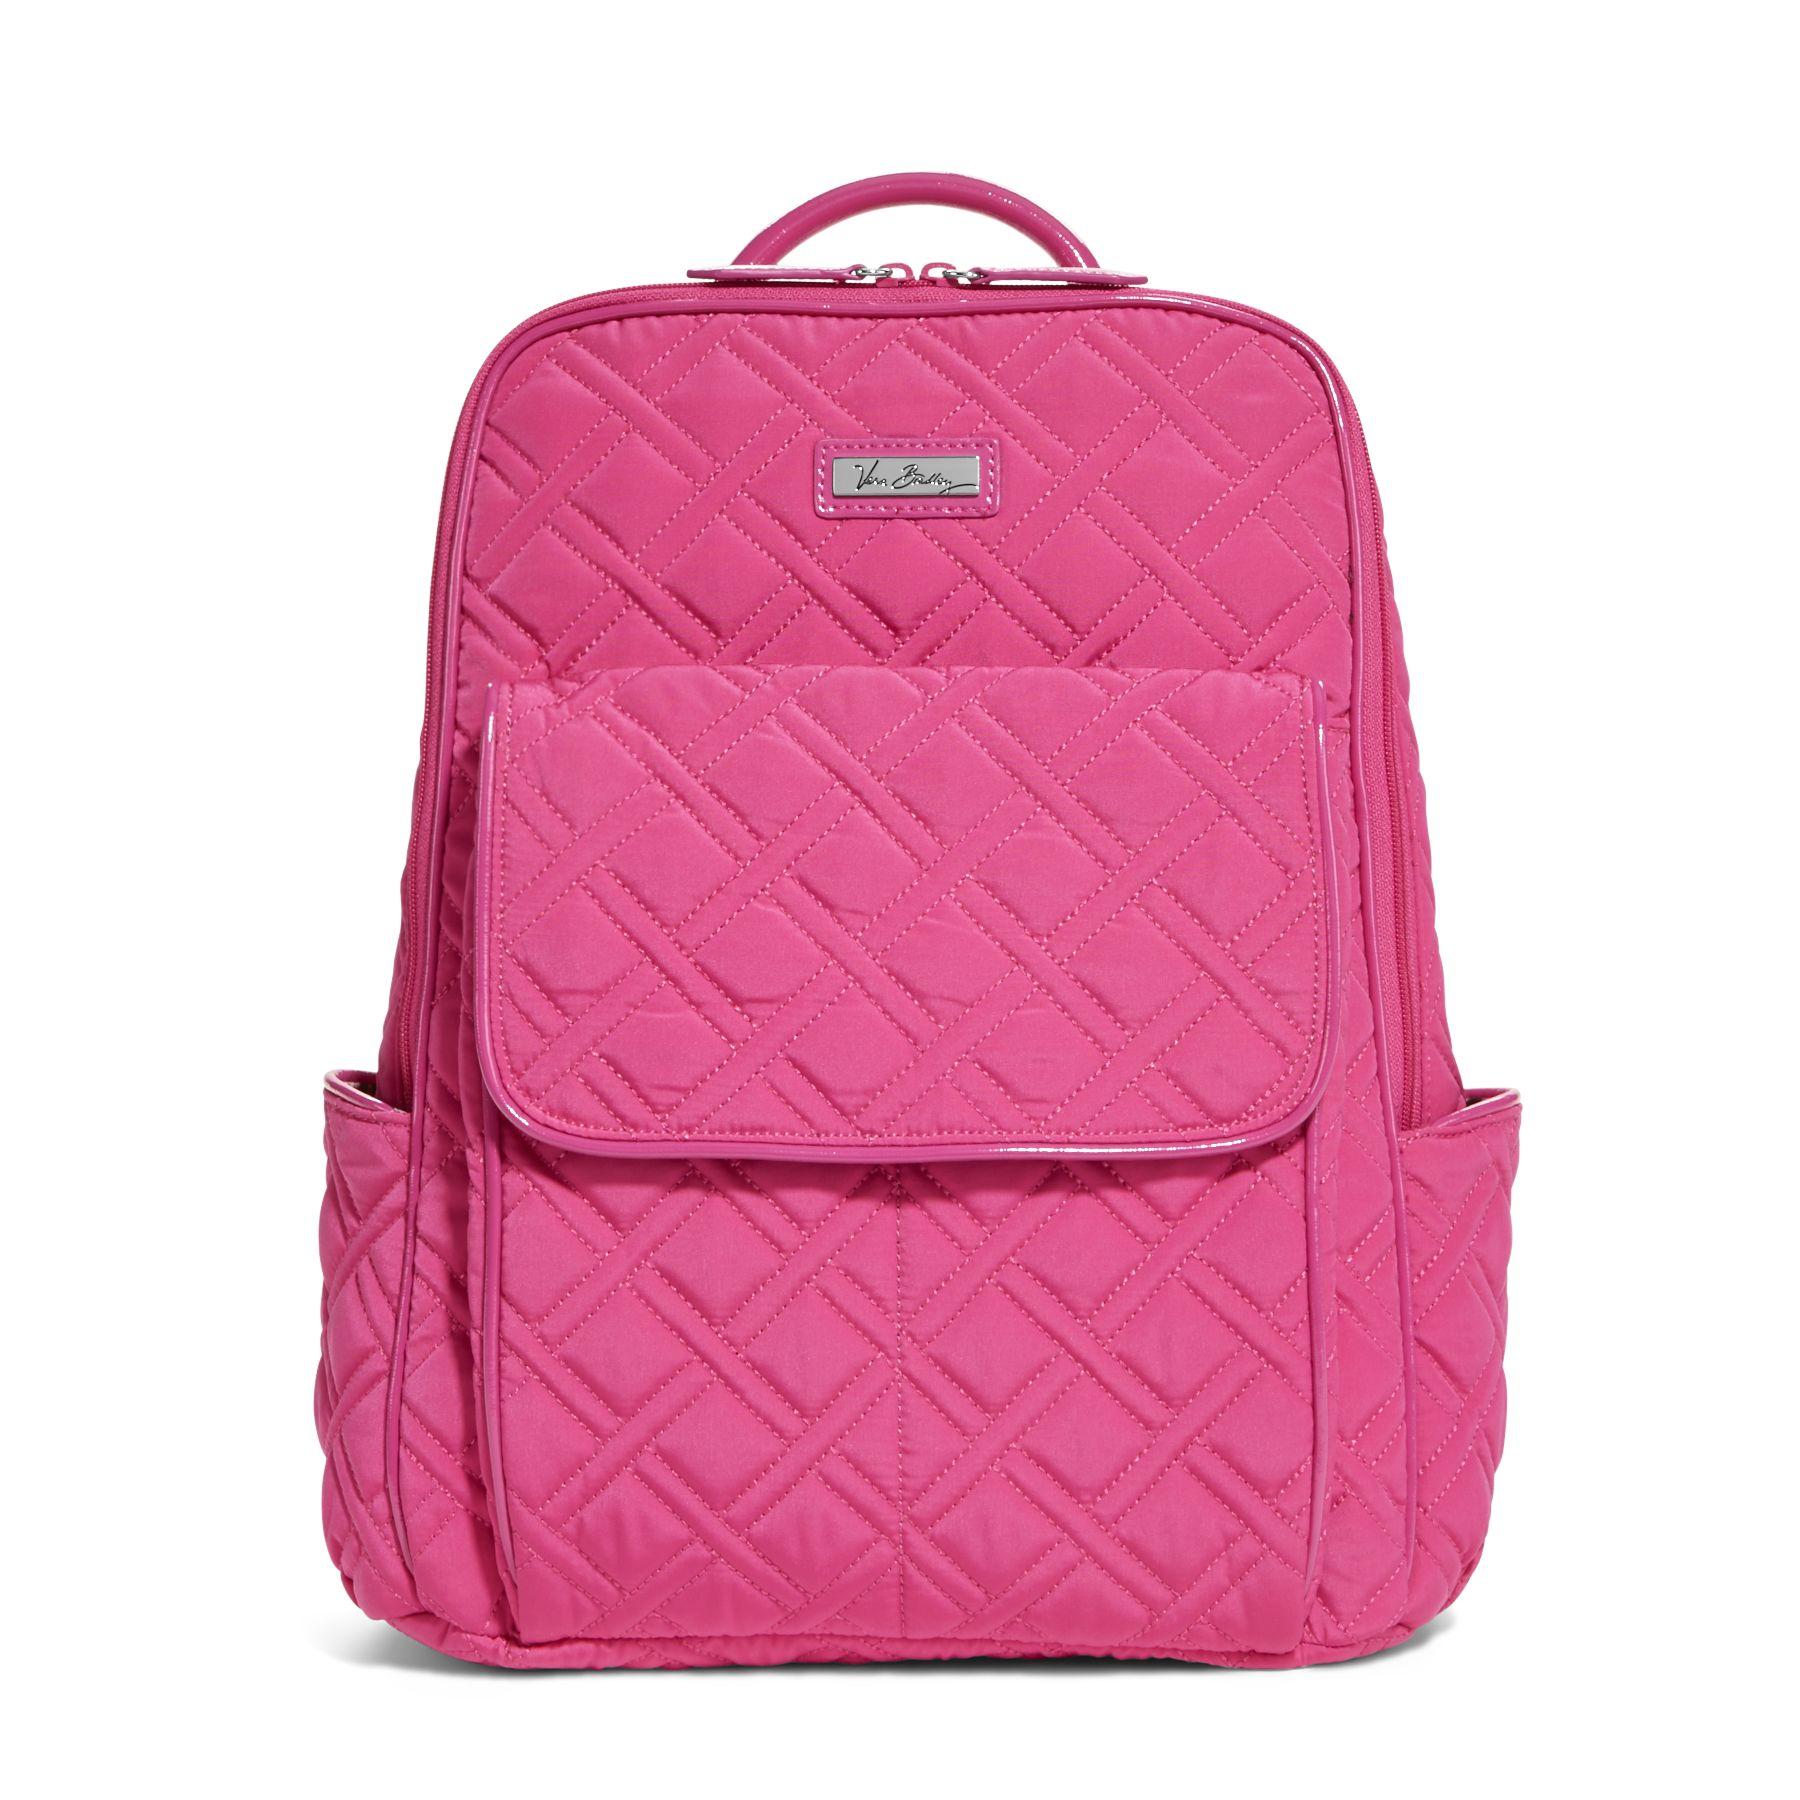 Vera Bradley Ultimate Backpack in Fuchsia with Fuchsia Trim